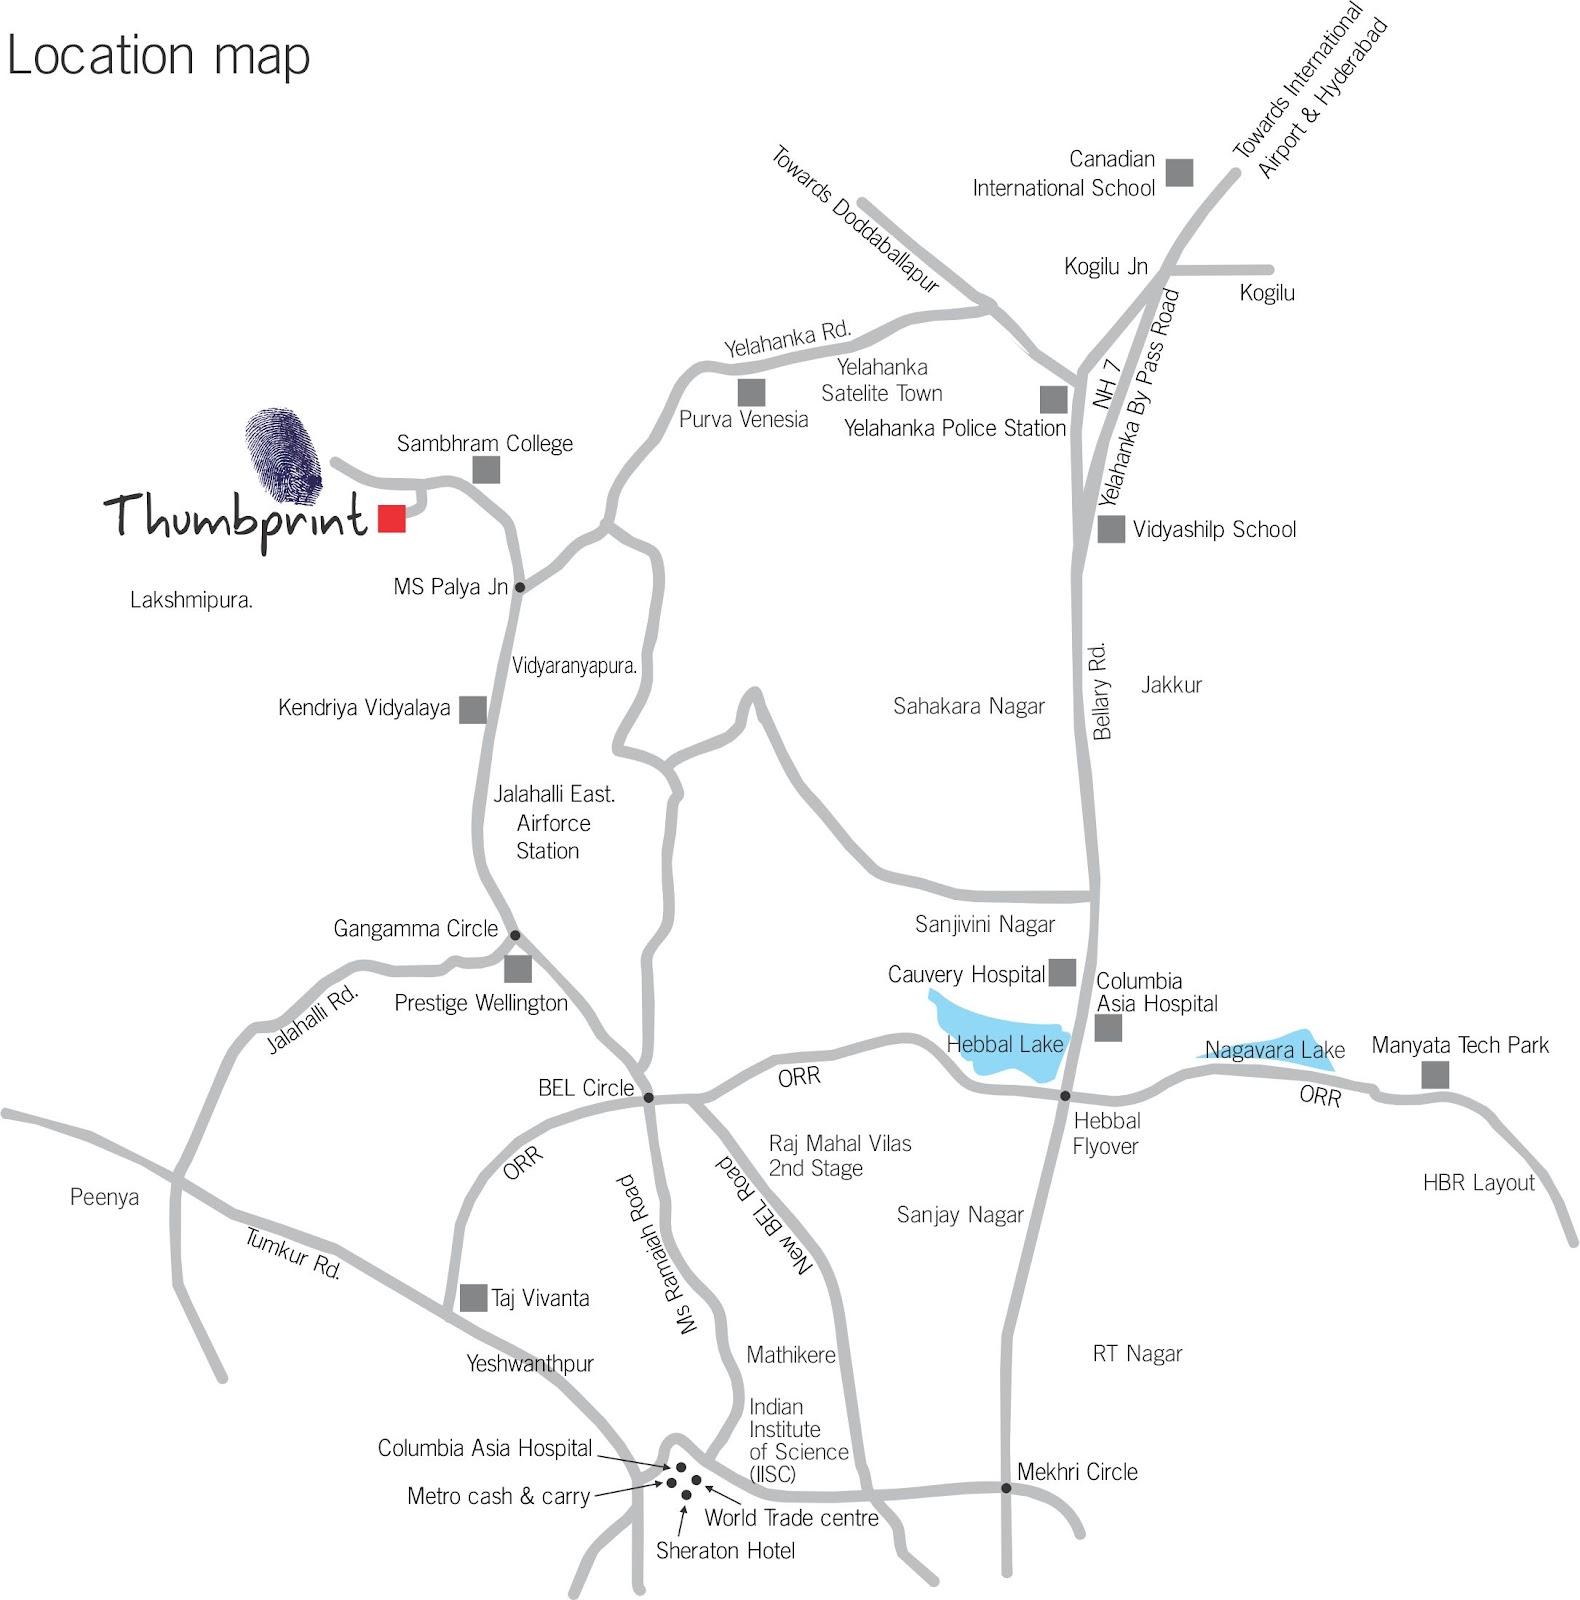 Thumbprint Vidyaranyapura